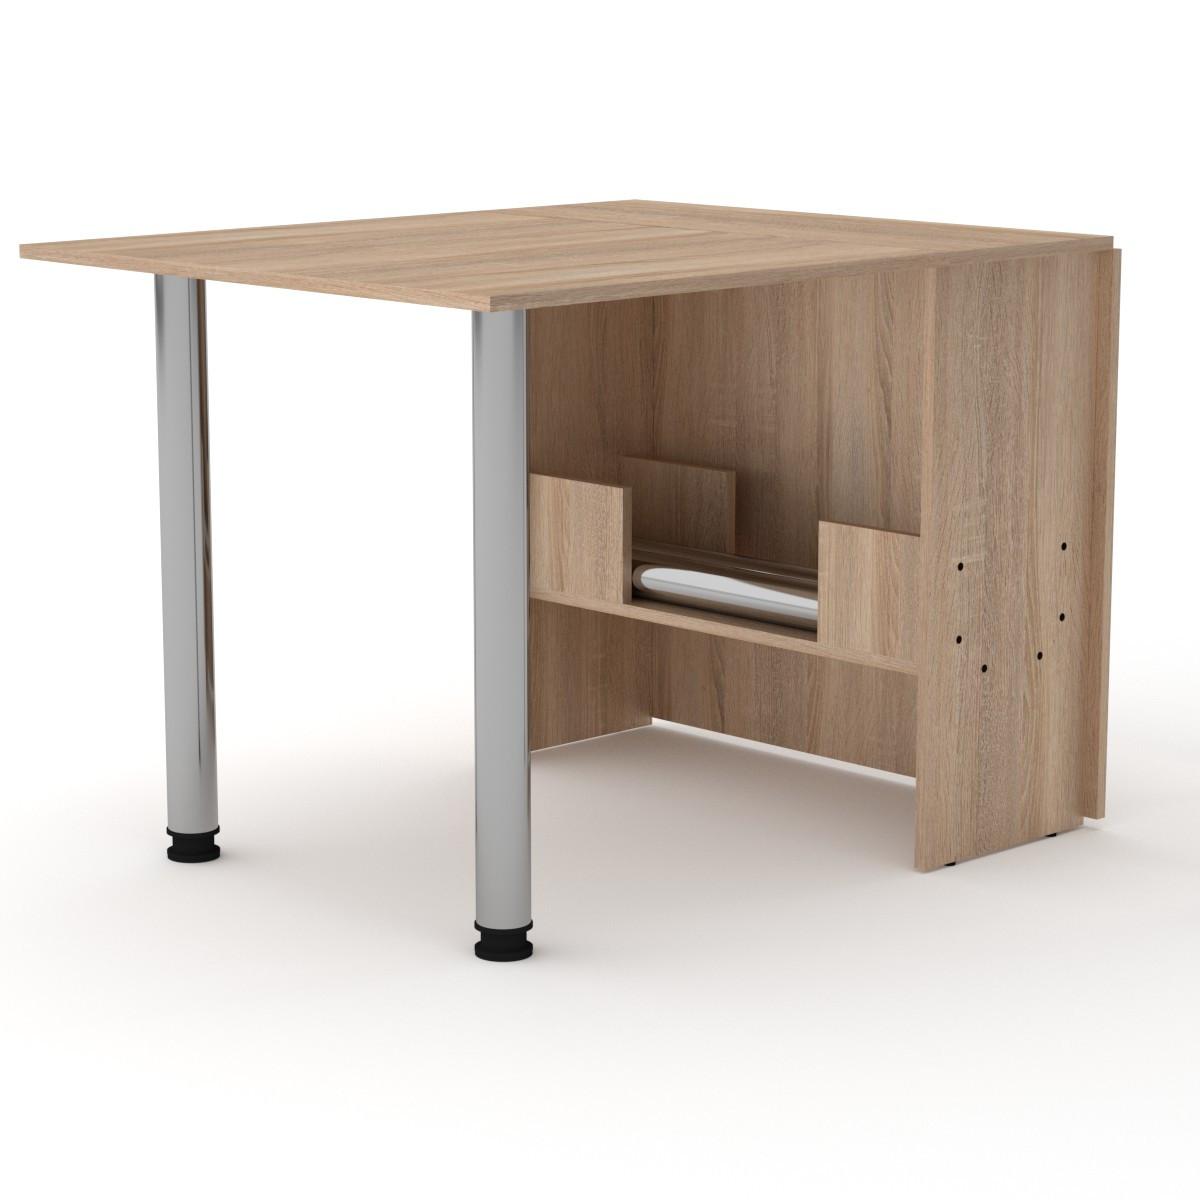 Стол книжка 2 дуб сонома Компанит (170х81х73 см)